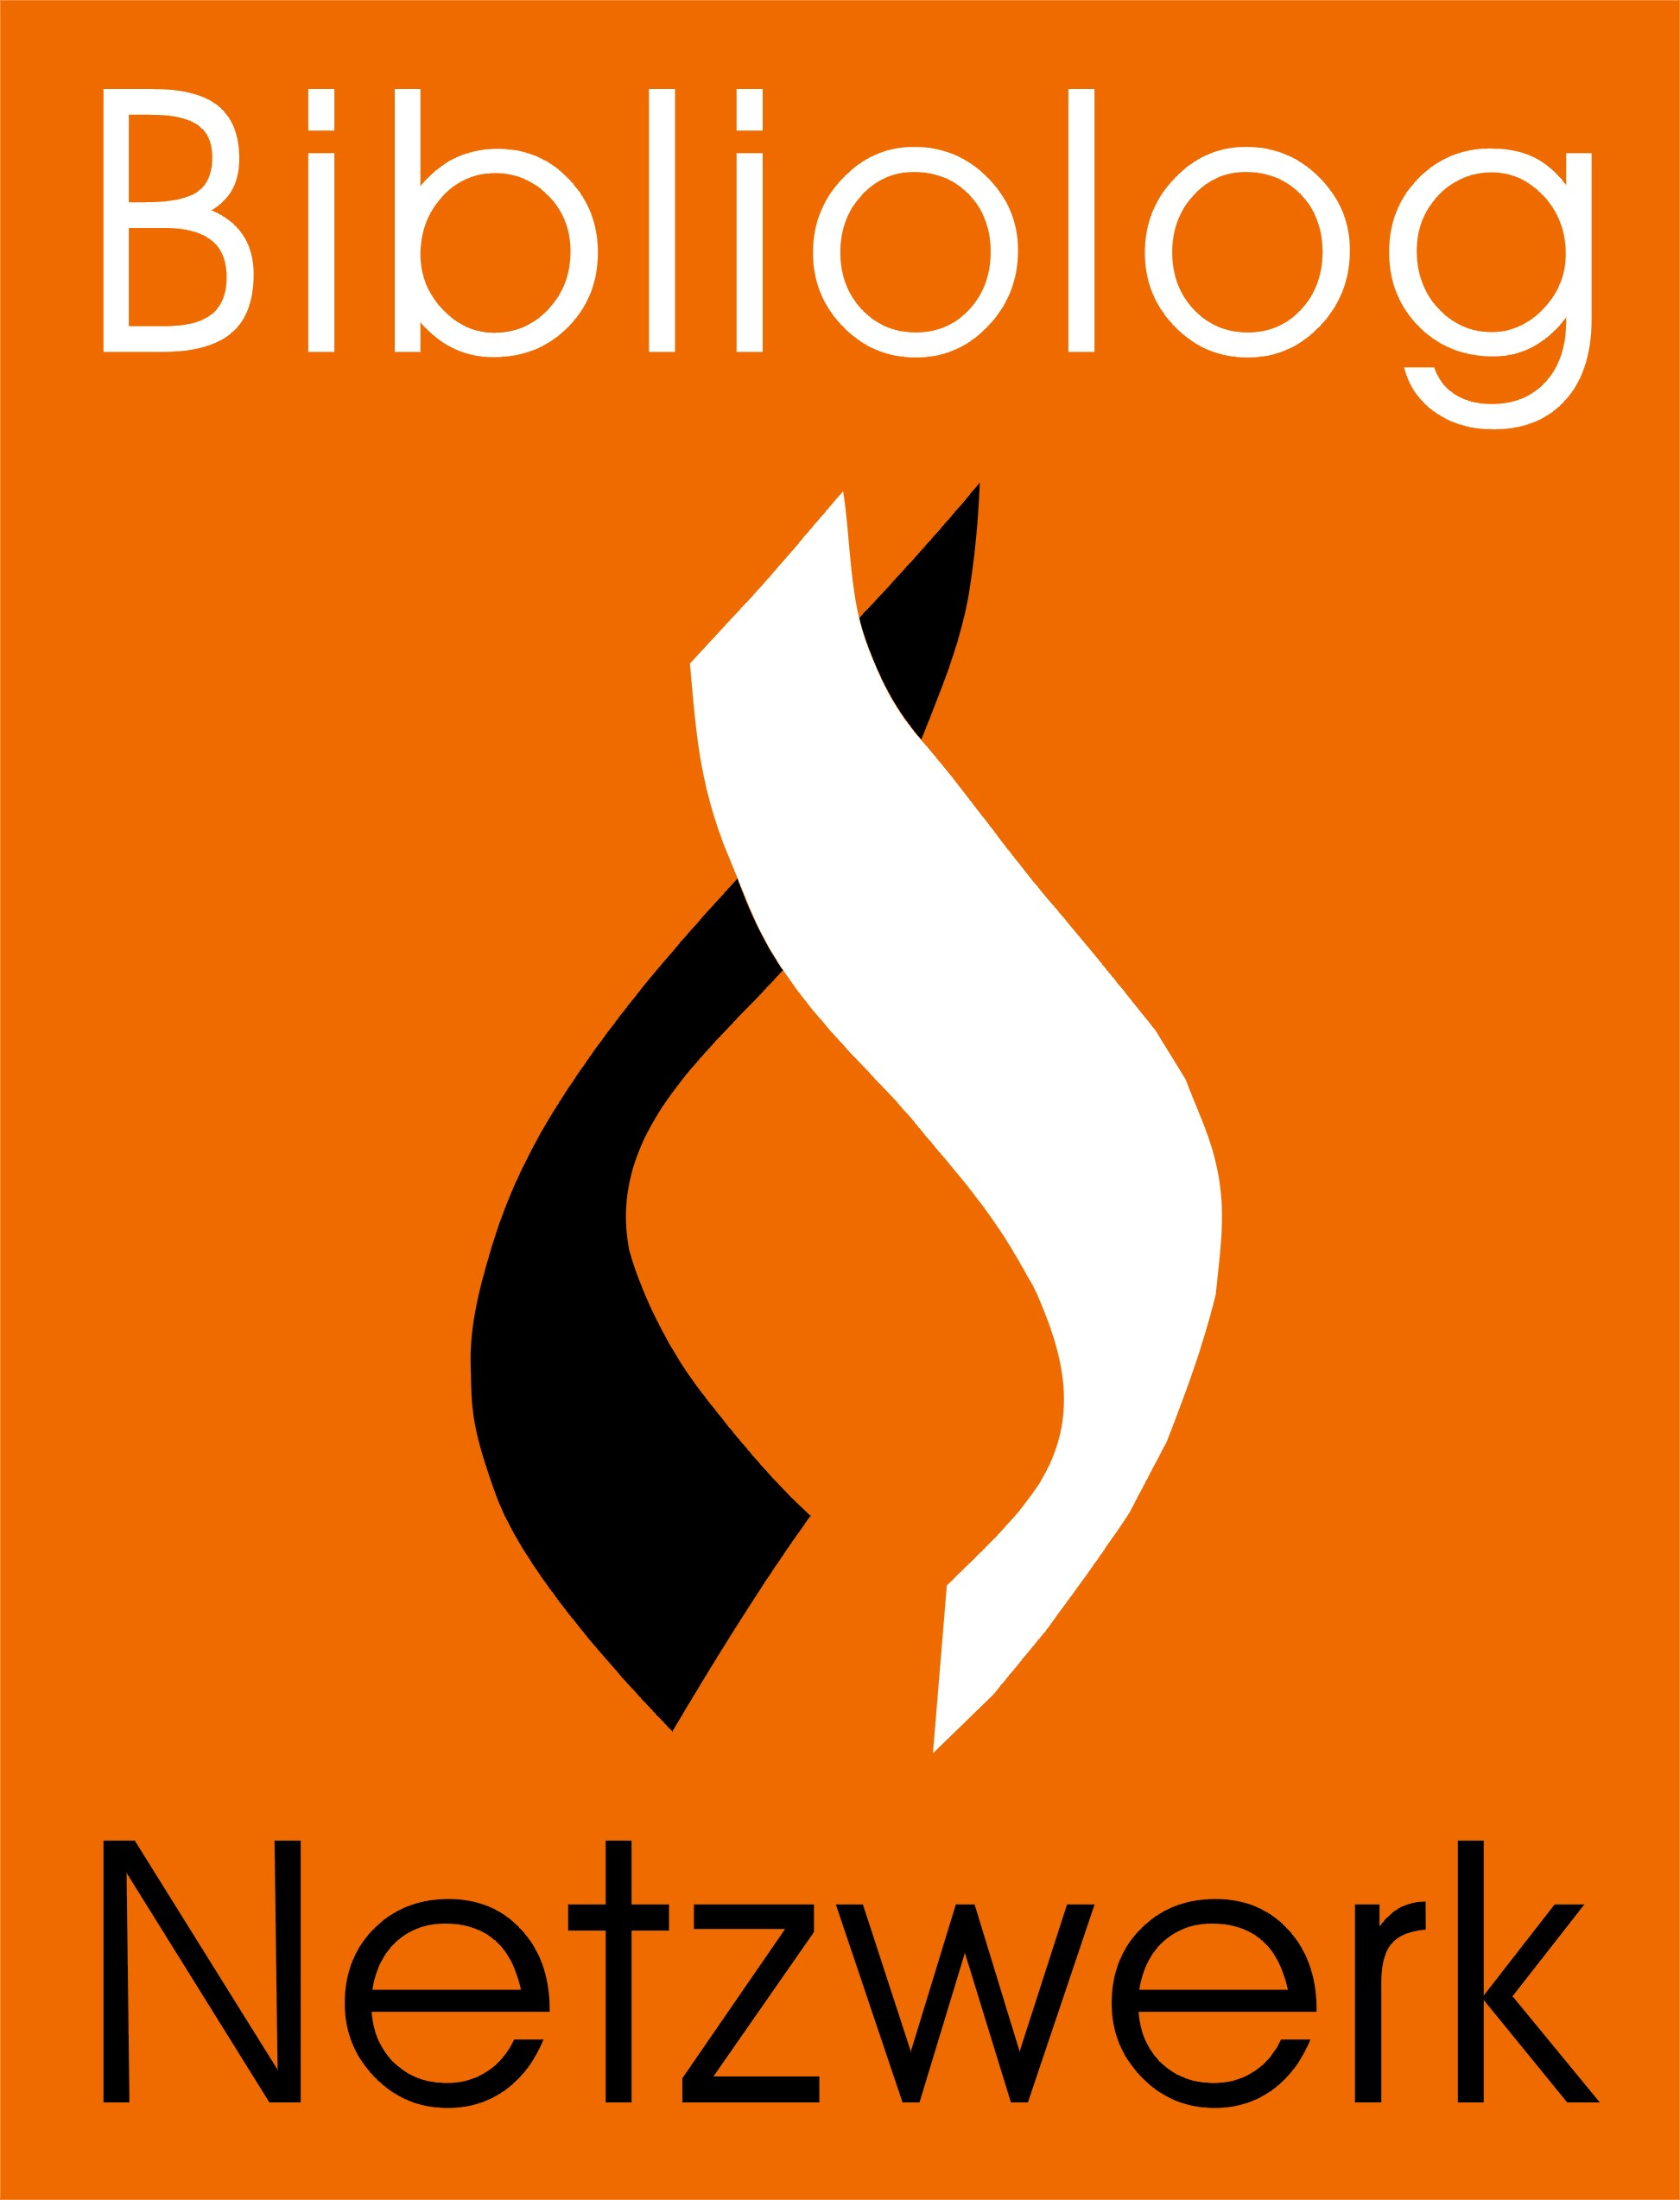 Bibliolog Logo